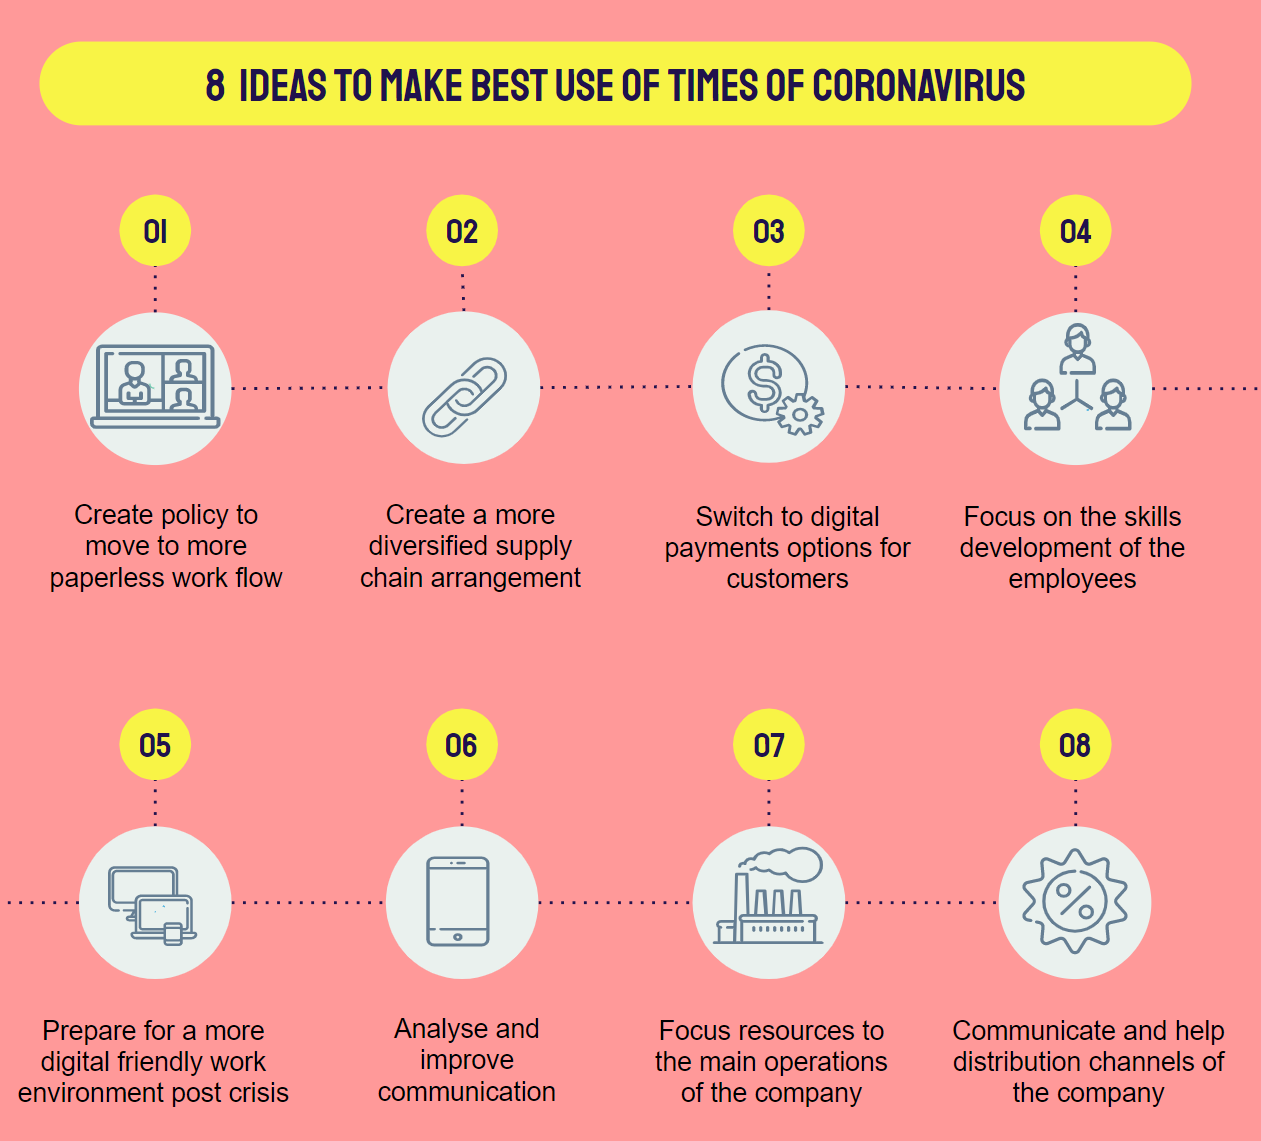 8 Ideas to make best use of times of coronavirus